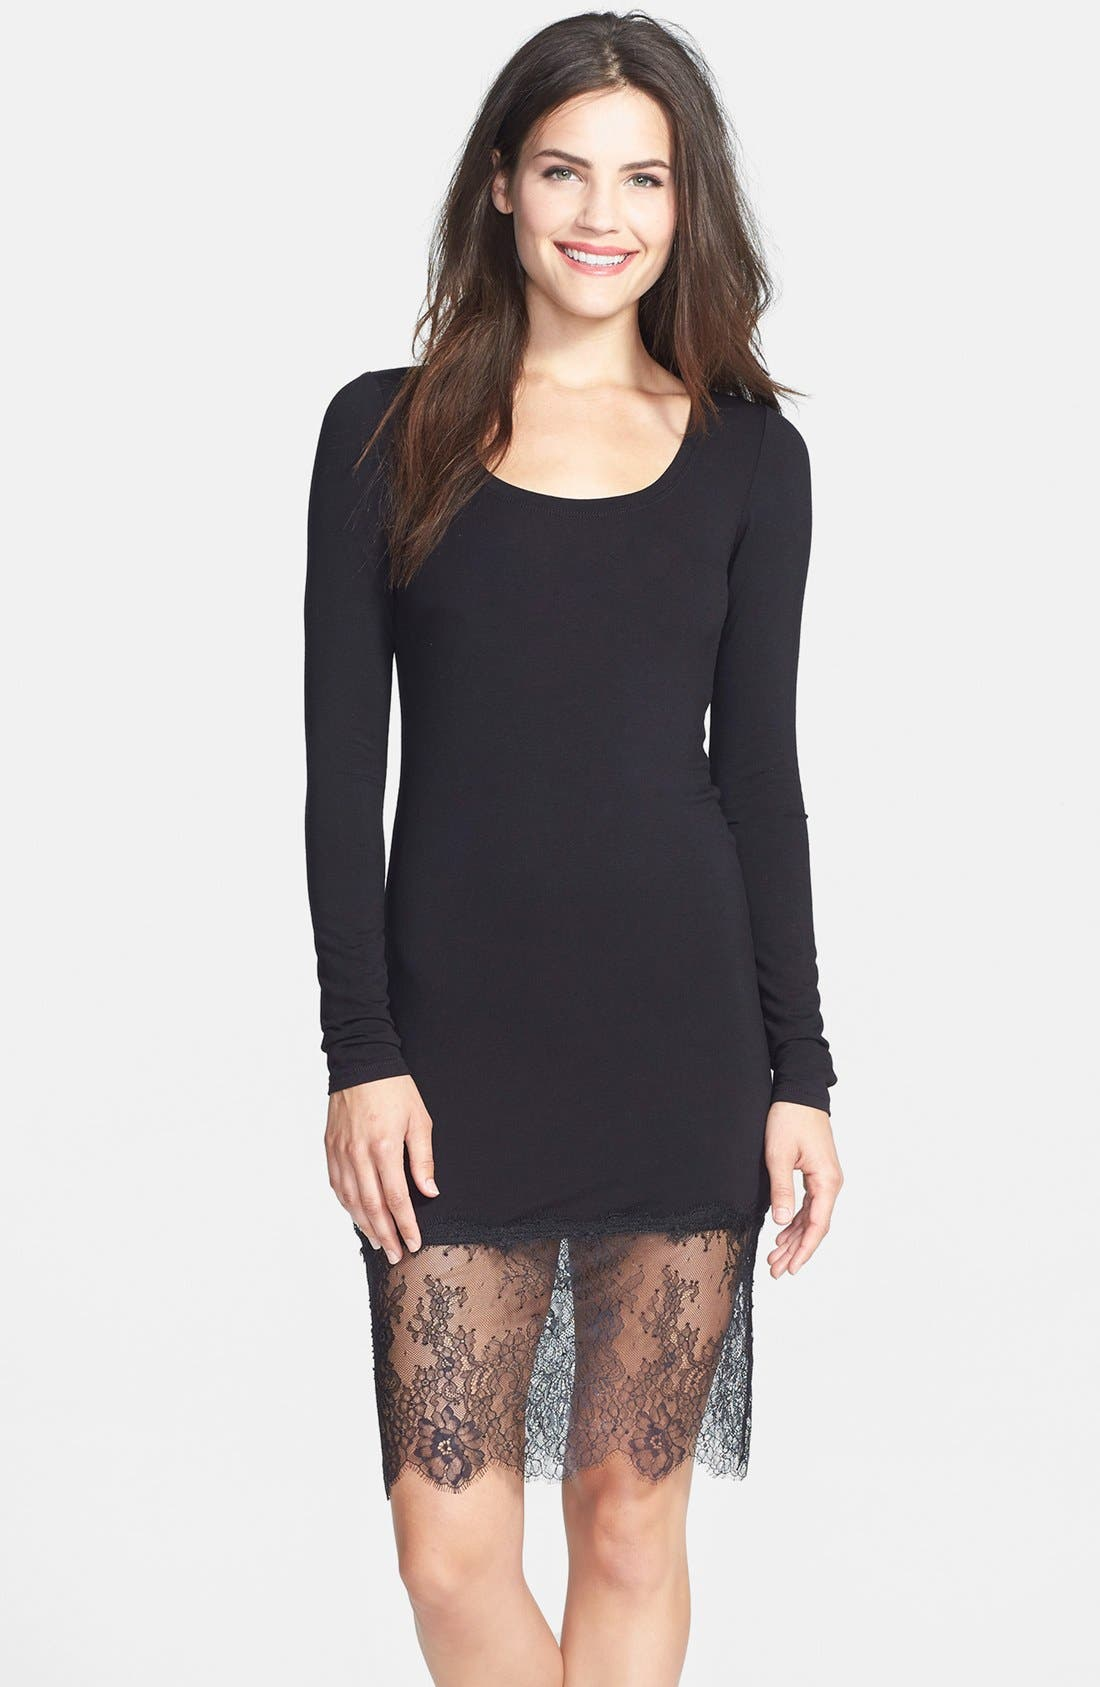 BCBGMAXAZRIA 'Livi' Lace & Jersey Knit Sheath Dress, Main, color, 001